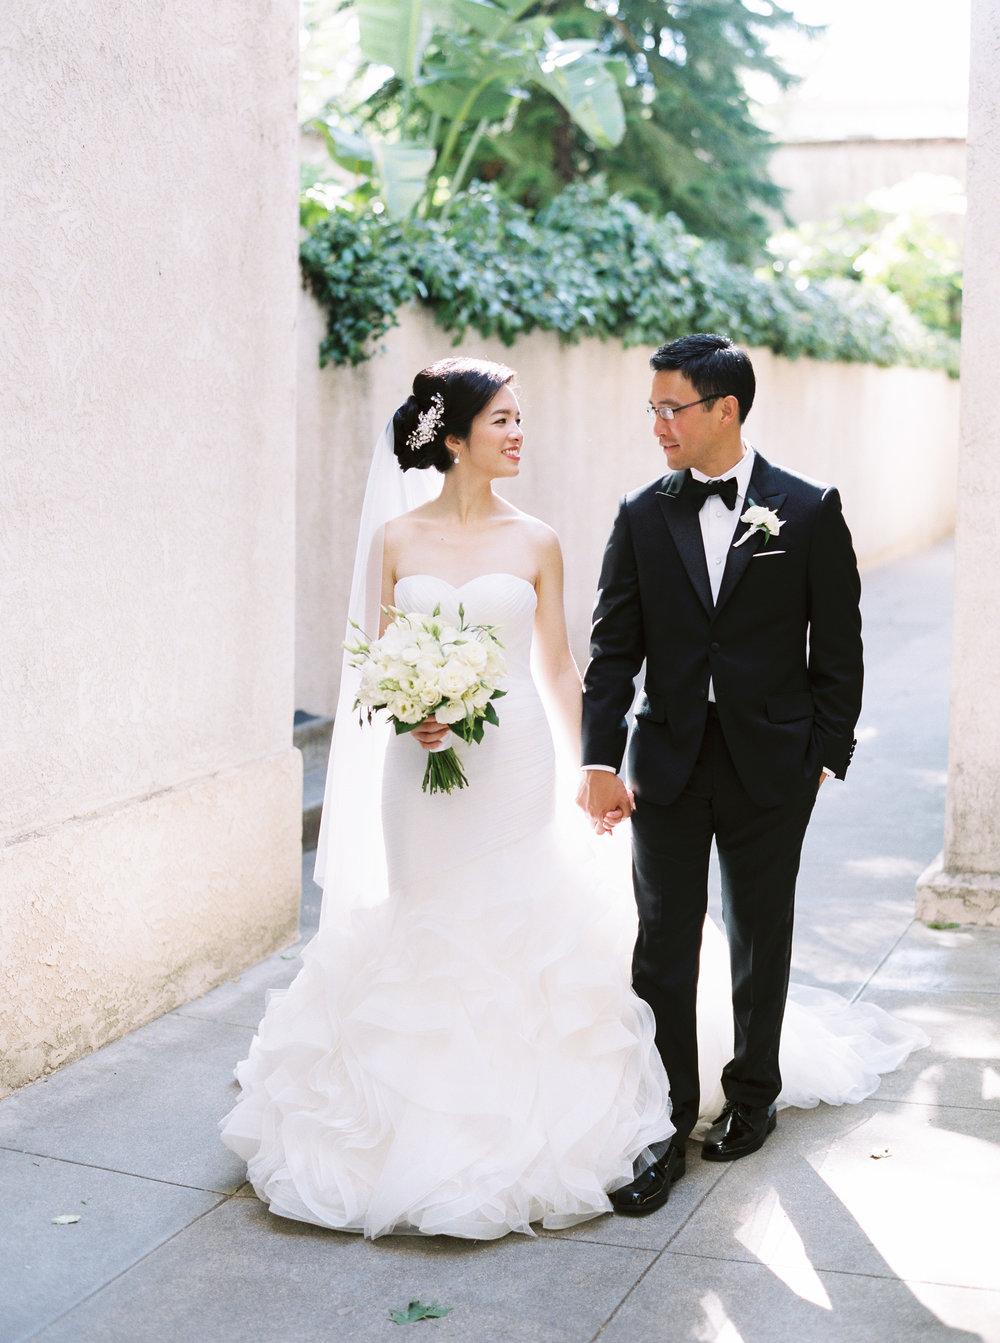 firehouse-restaurant-wedding-in-downtown-sacramento-california-30.jpg